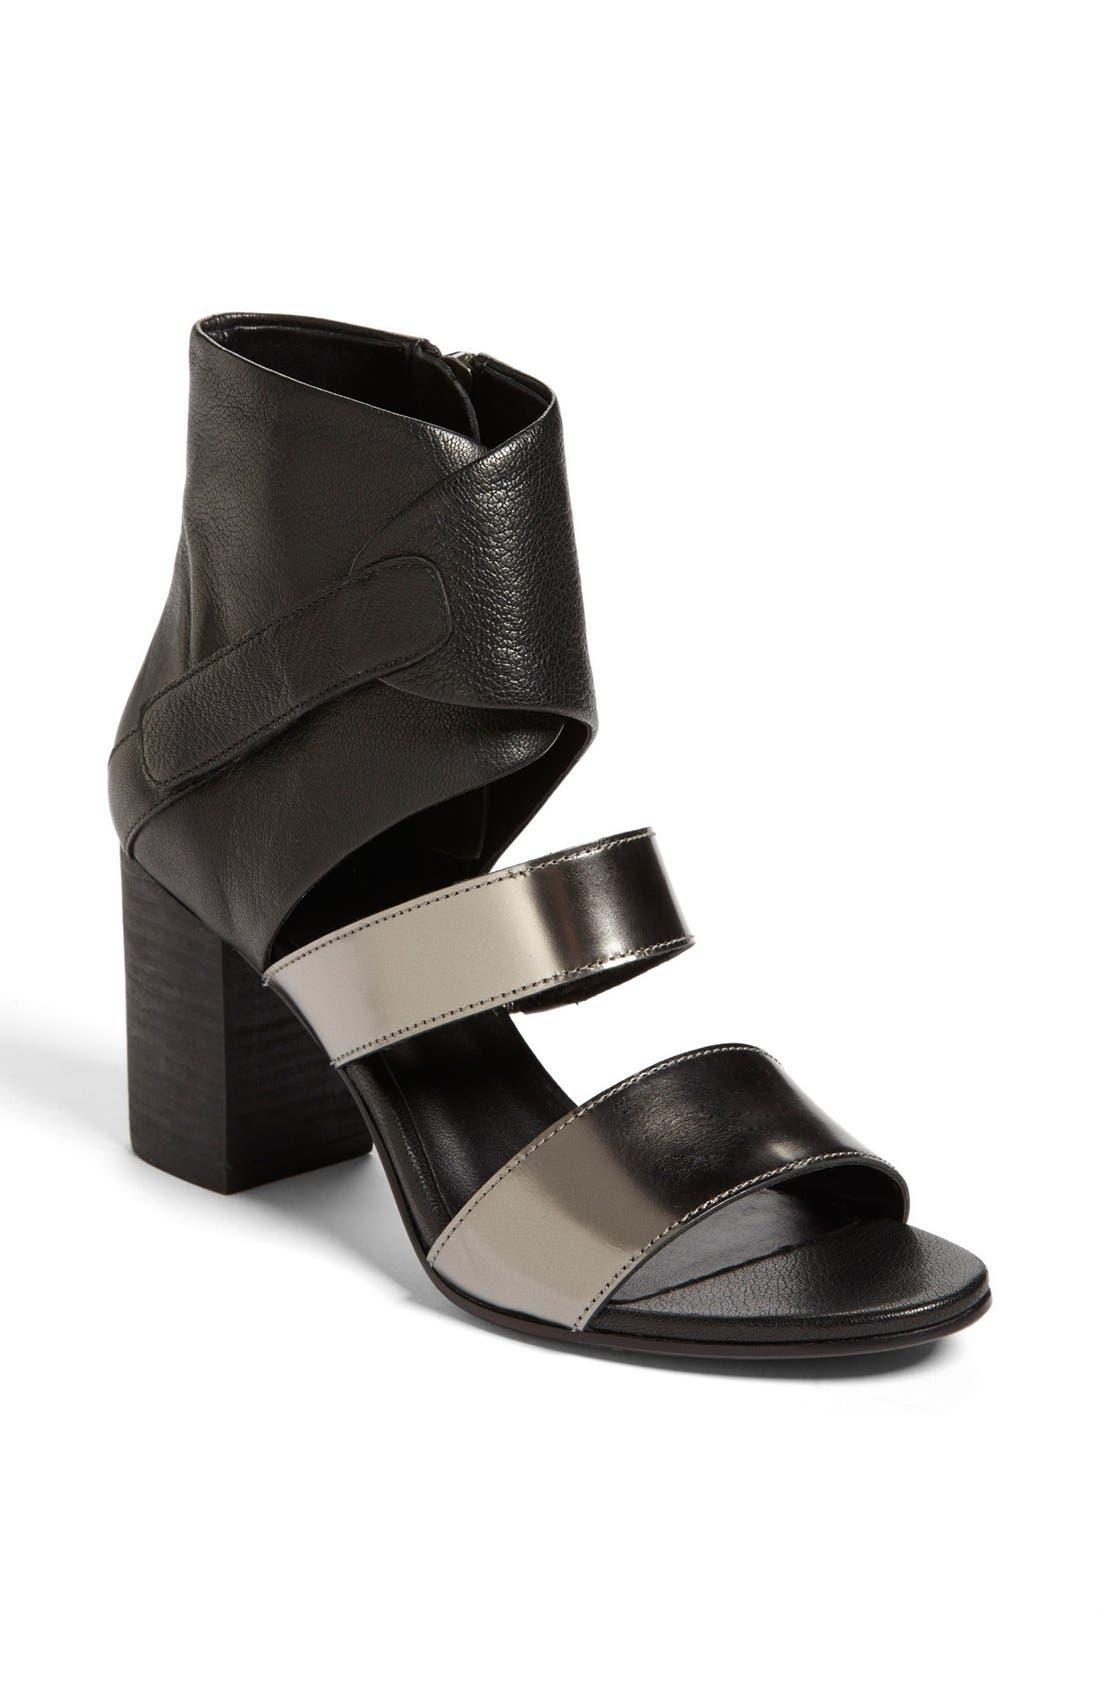 Main Image - Eileen Fisher 'Tier' Sandal